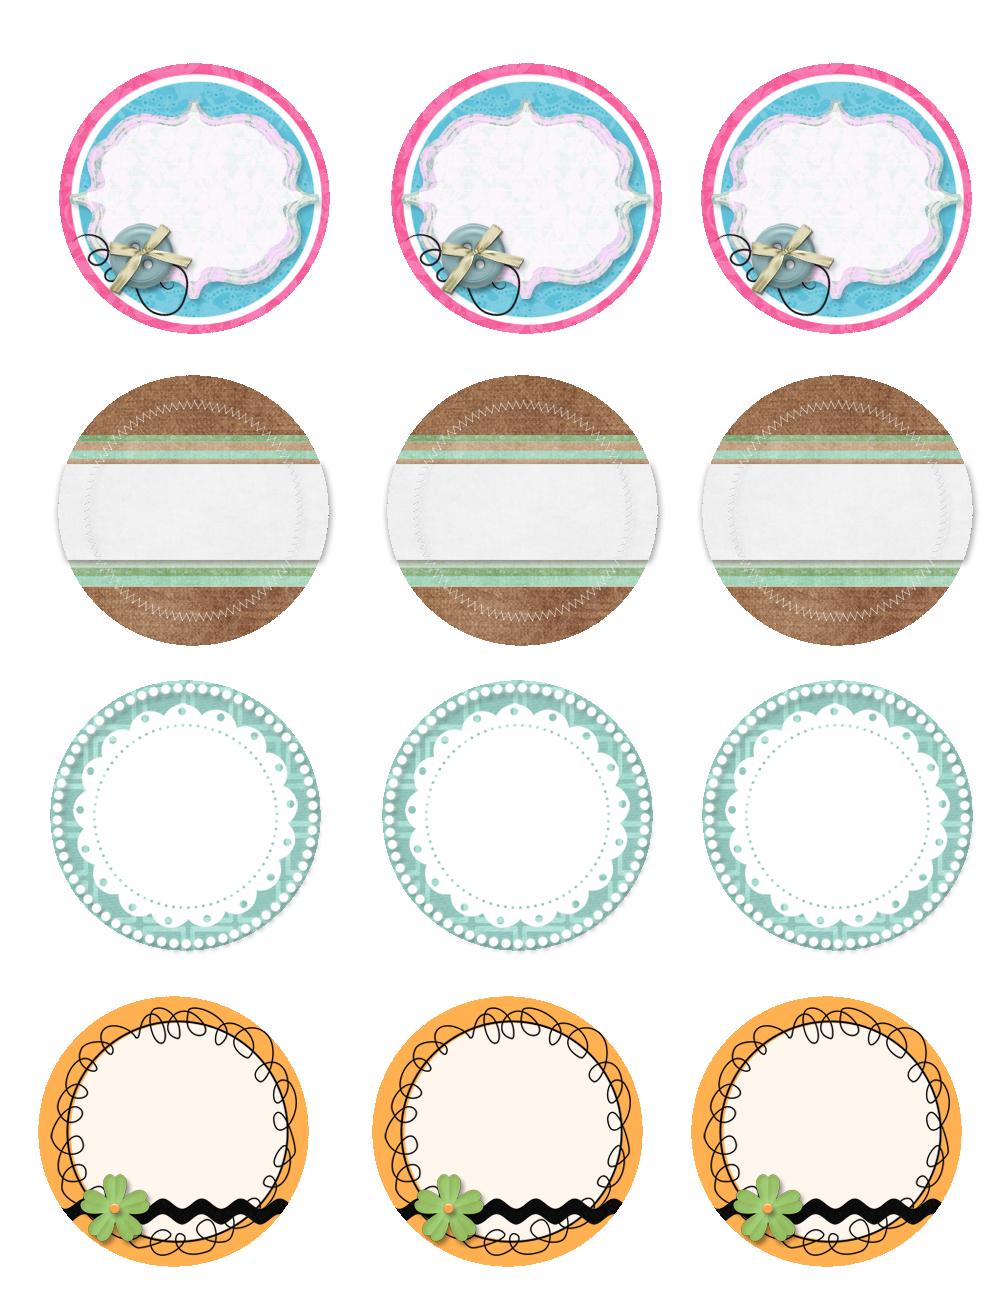 Free Printable Jar Labels. | Diy | Mason Jar Lids, Jar Lids, Canning - Free Printable Jar Label Templates